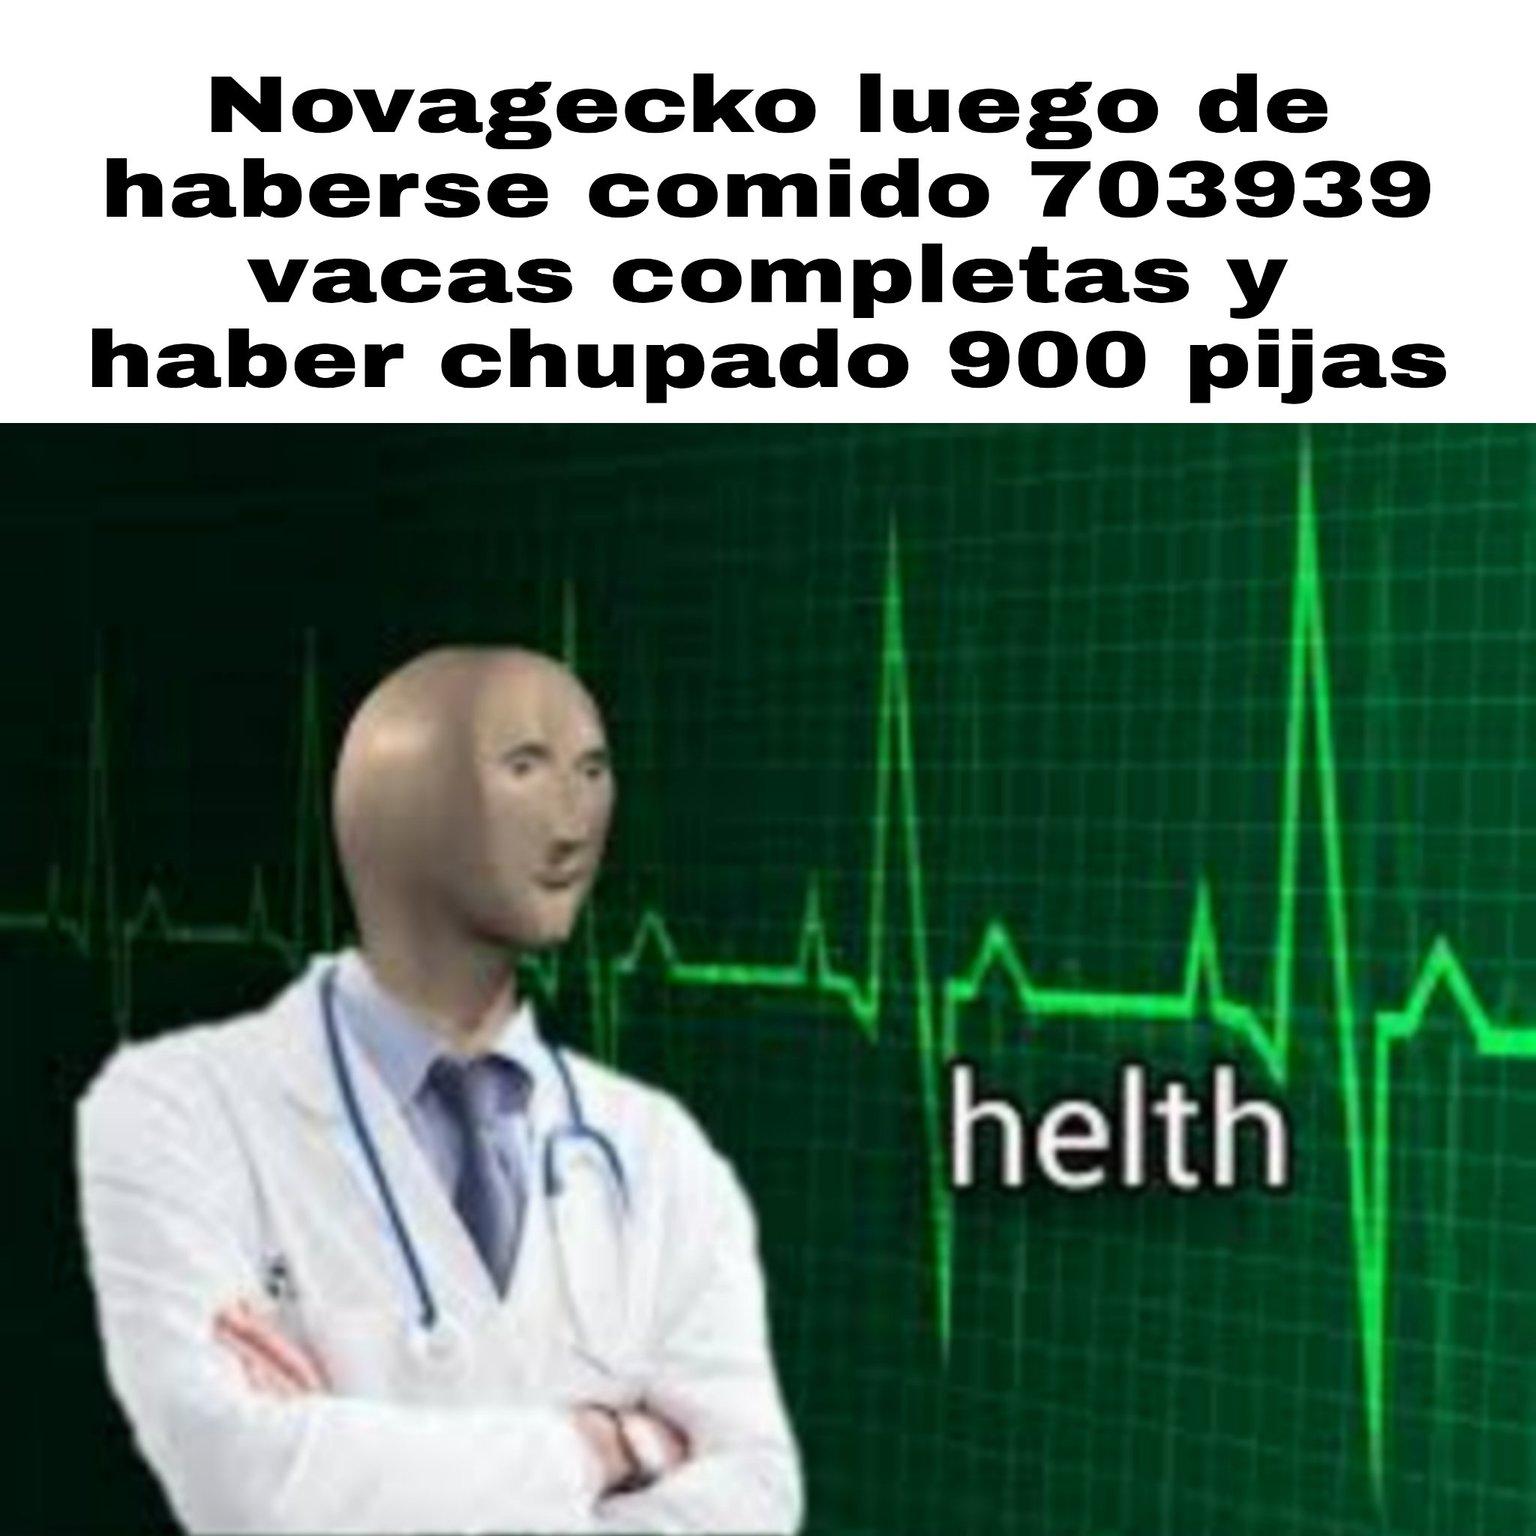 Novagarka y su dieta diaria - meme